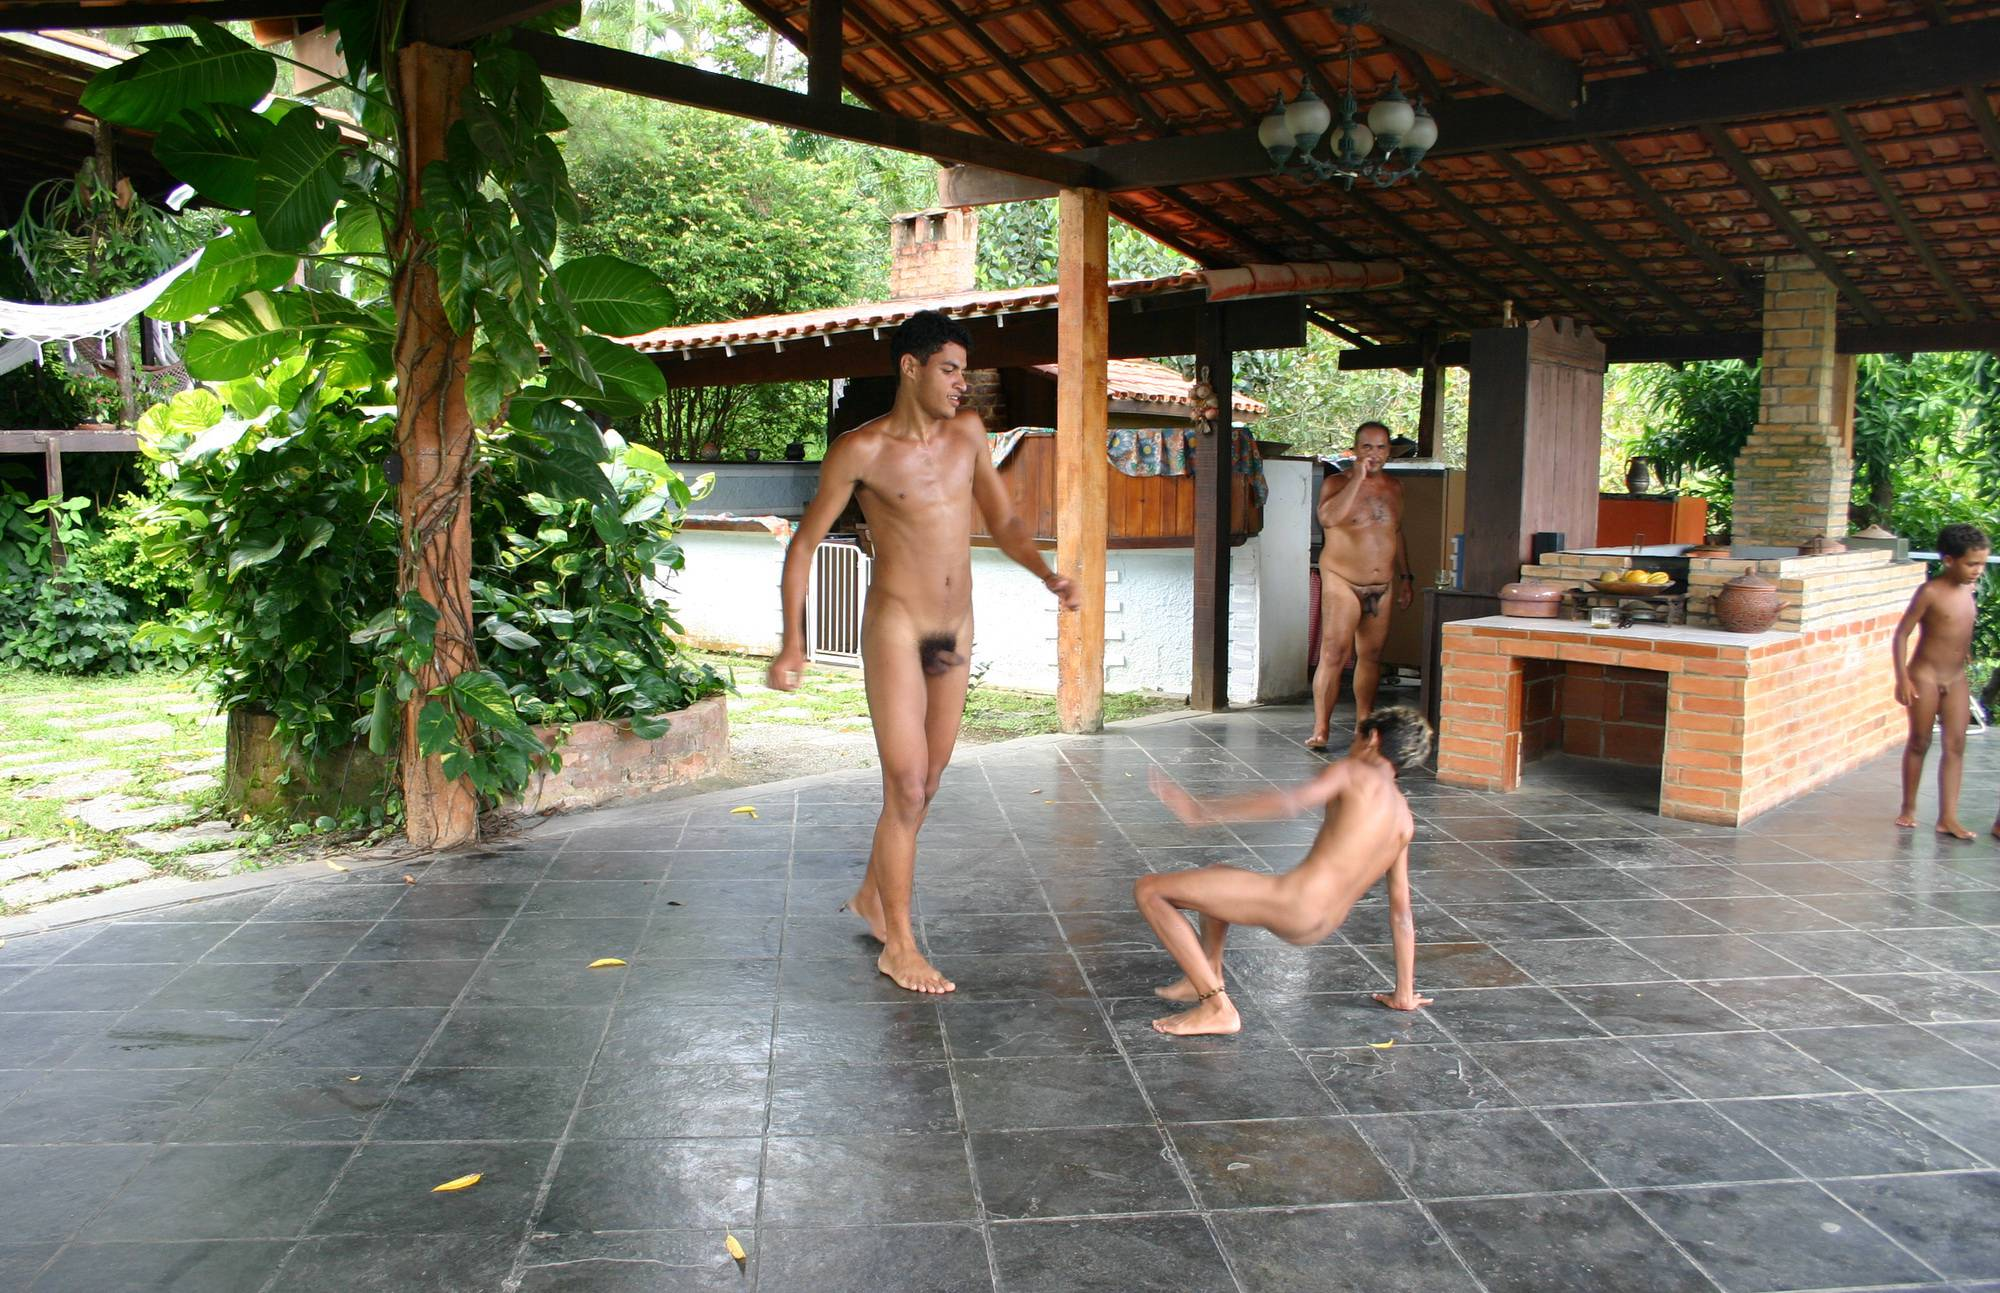 Pure Nudism Gallery-Brazilian Men Are Dancing - 1